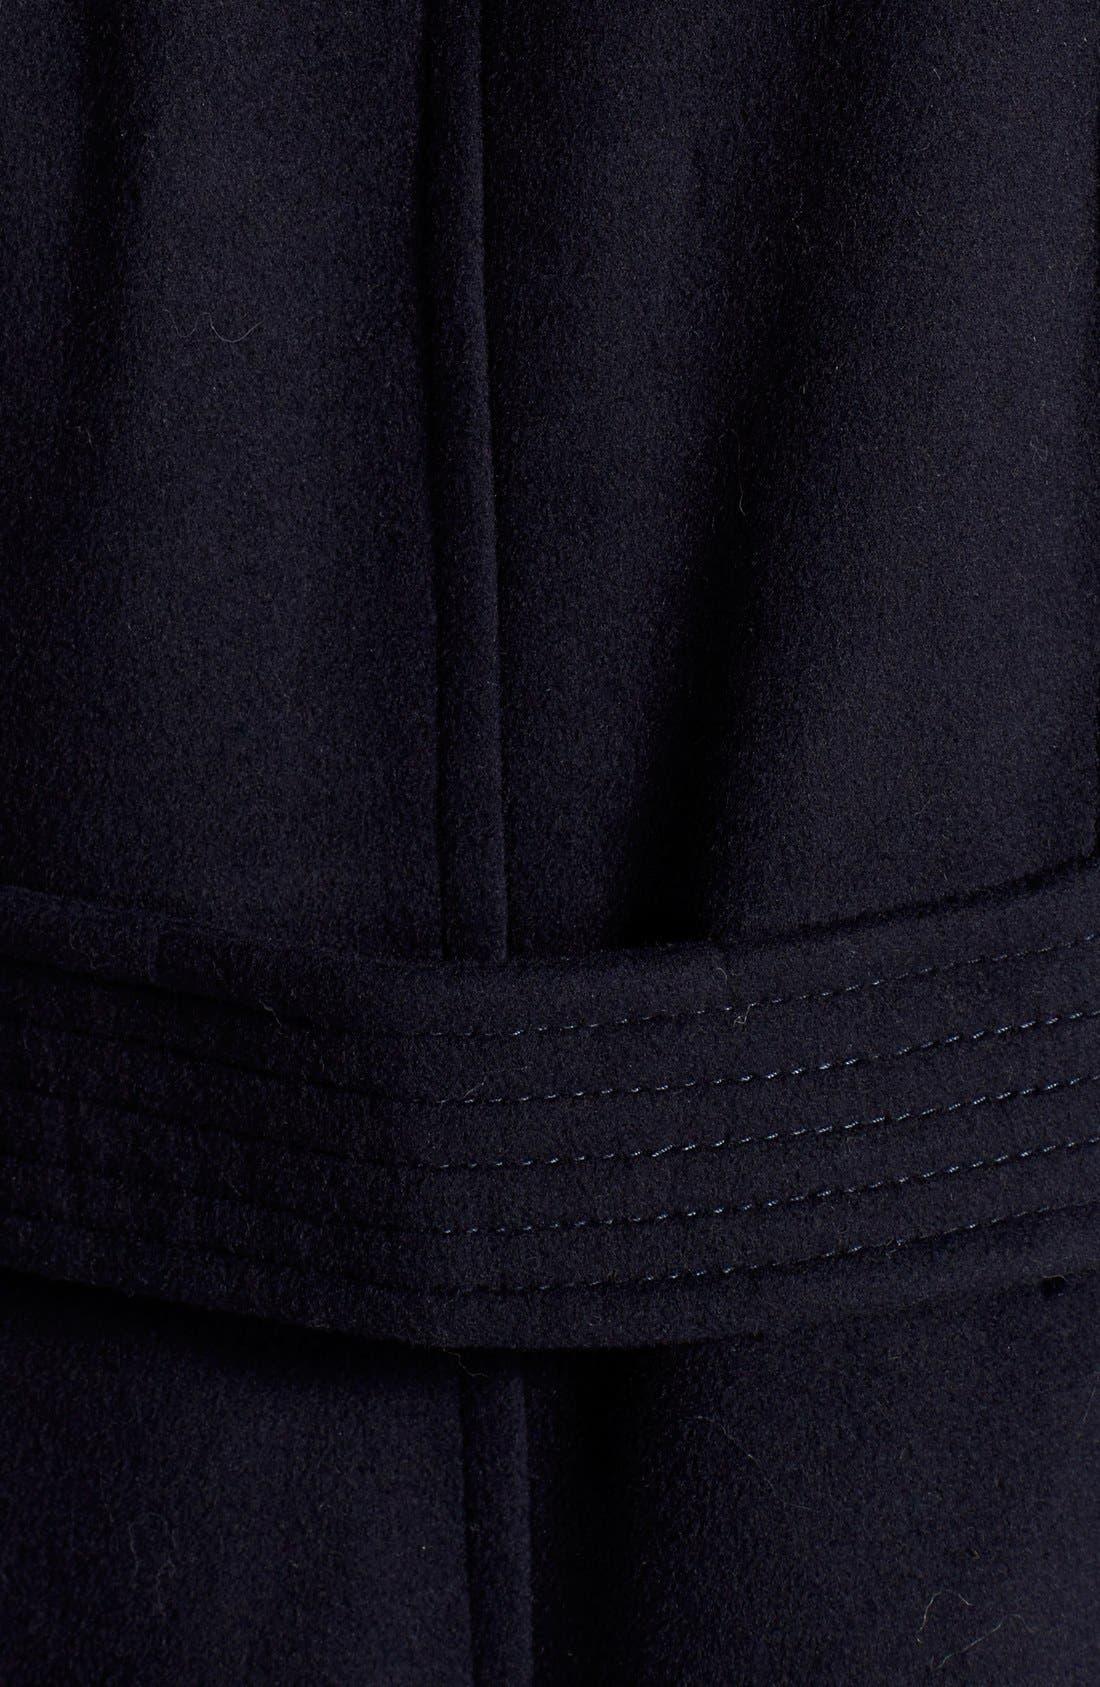 Alternate Image 3  - BCBGMAXAZRIA Faux Leather Trim Wool Blend Duffle Coat with Inset Bib